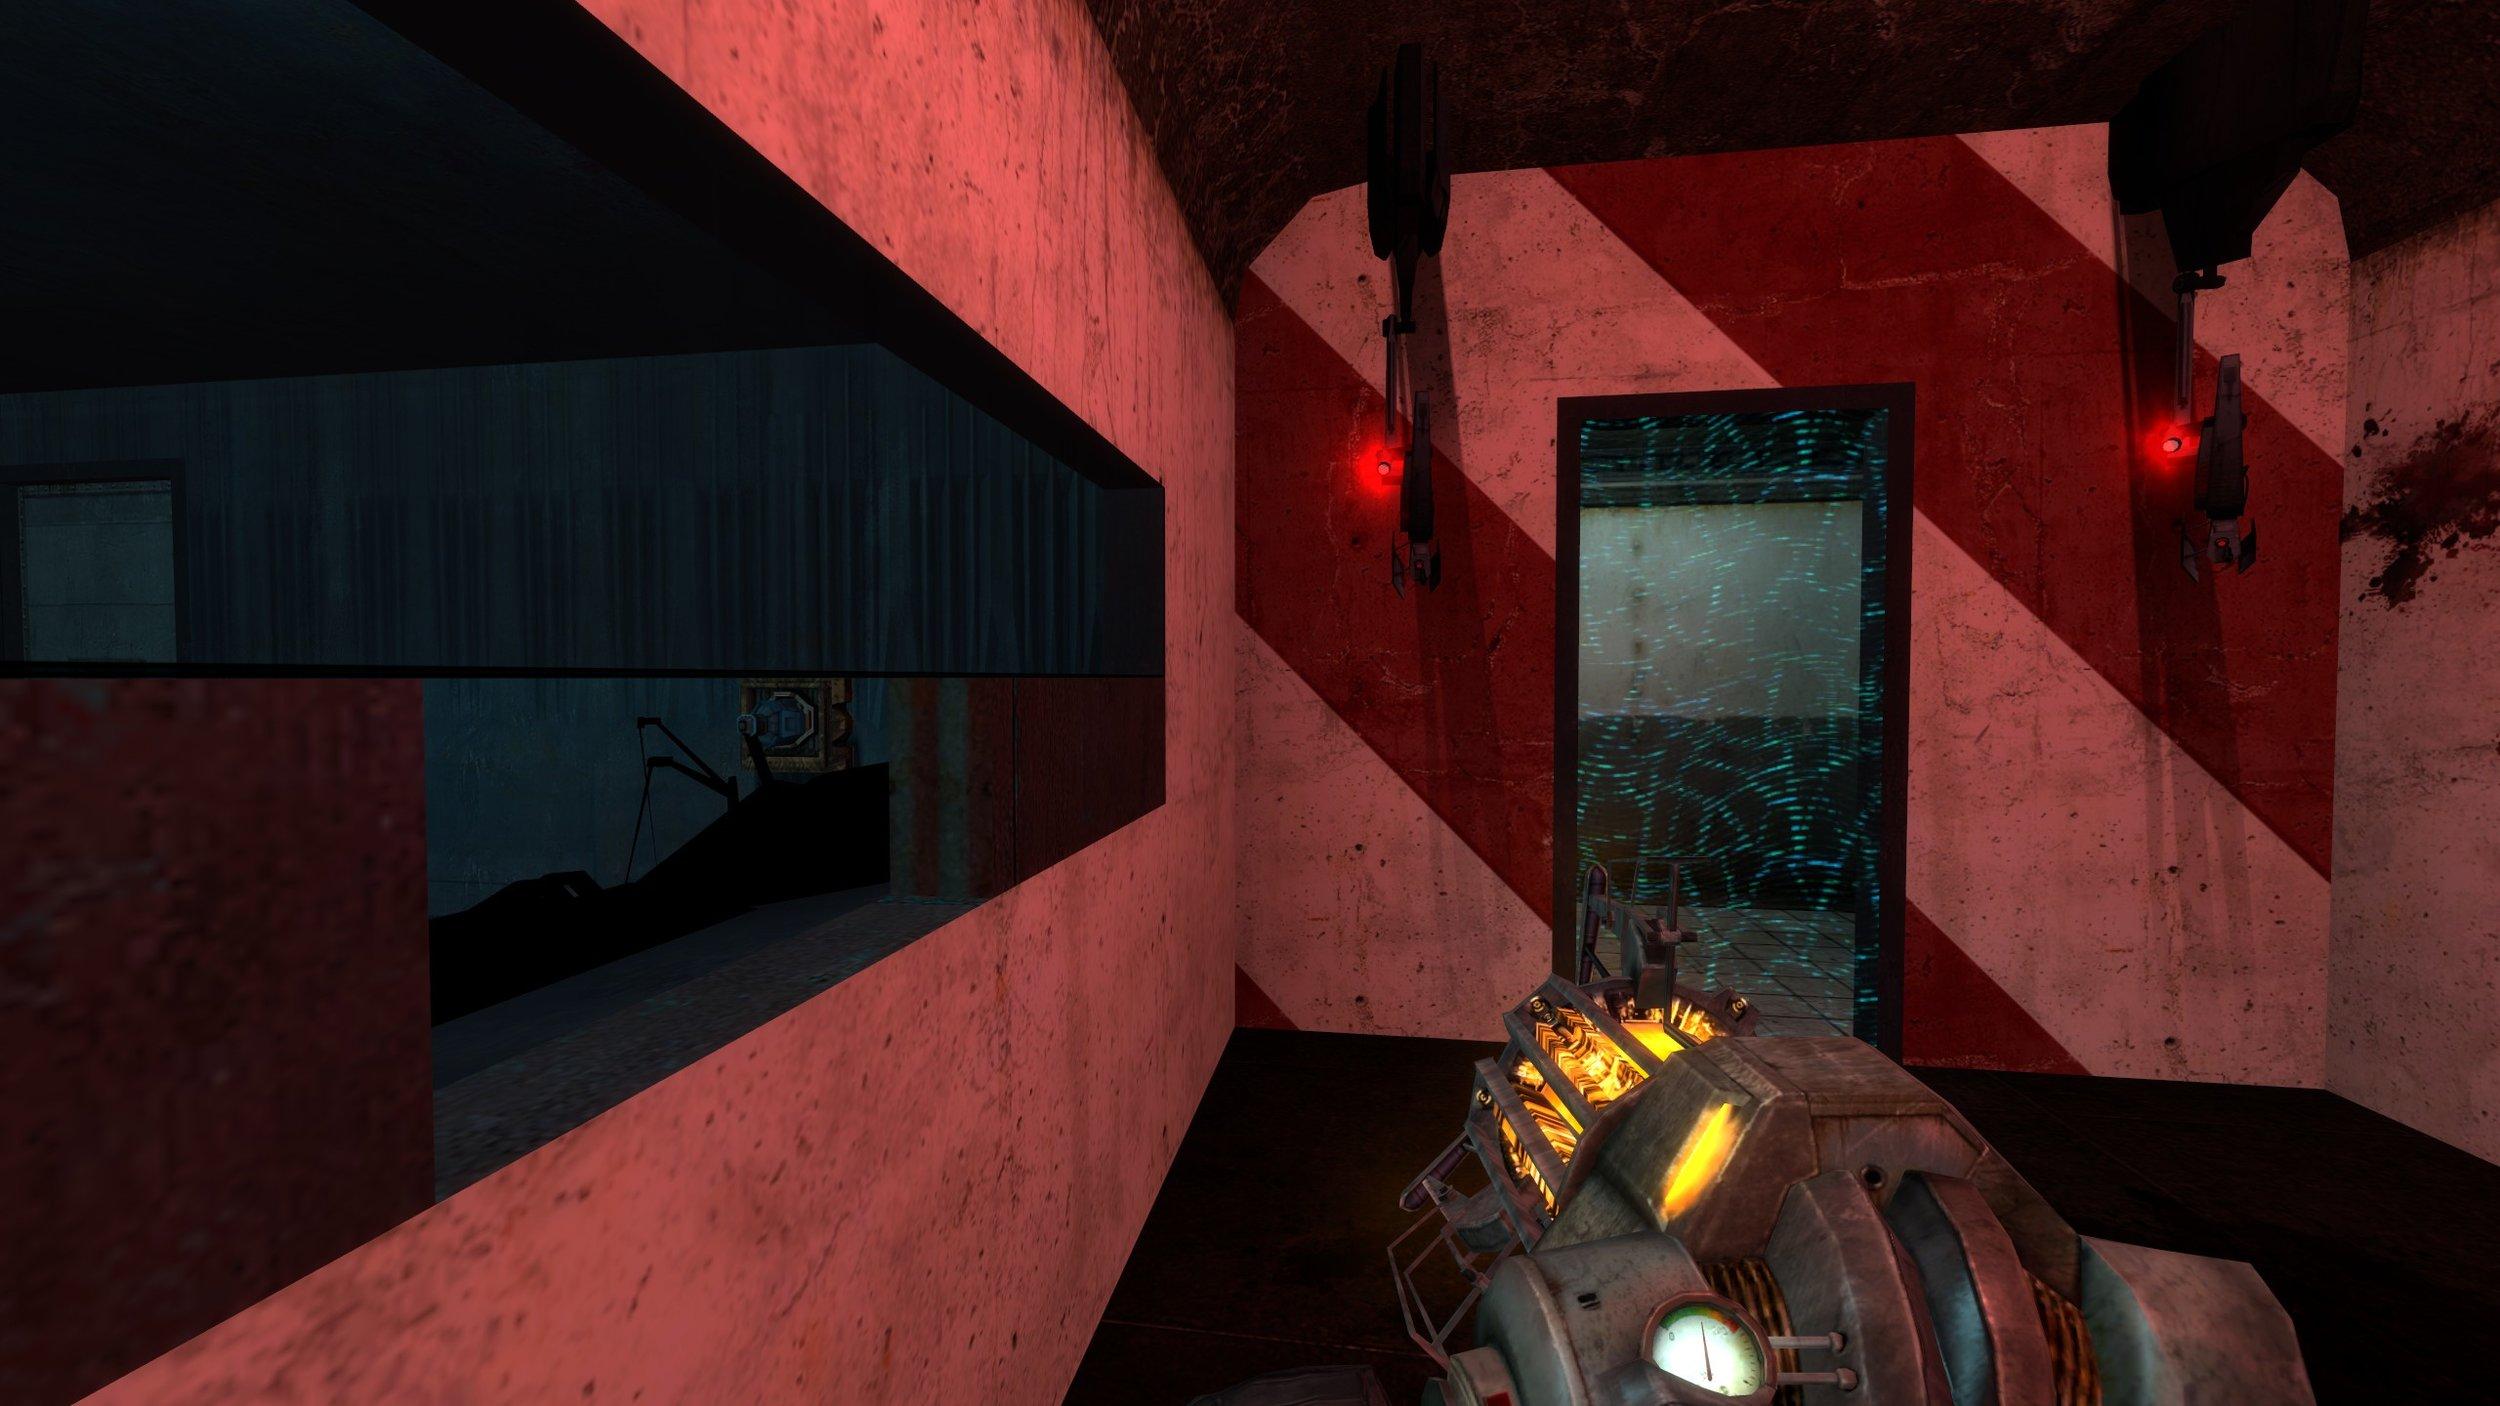 The turret trap room